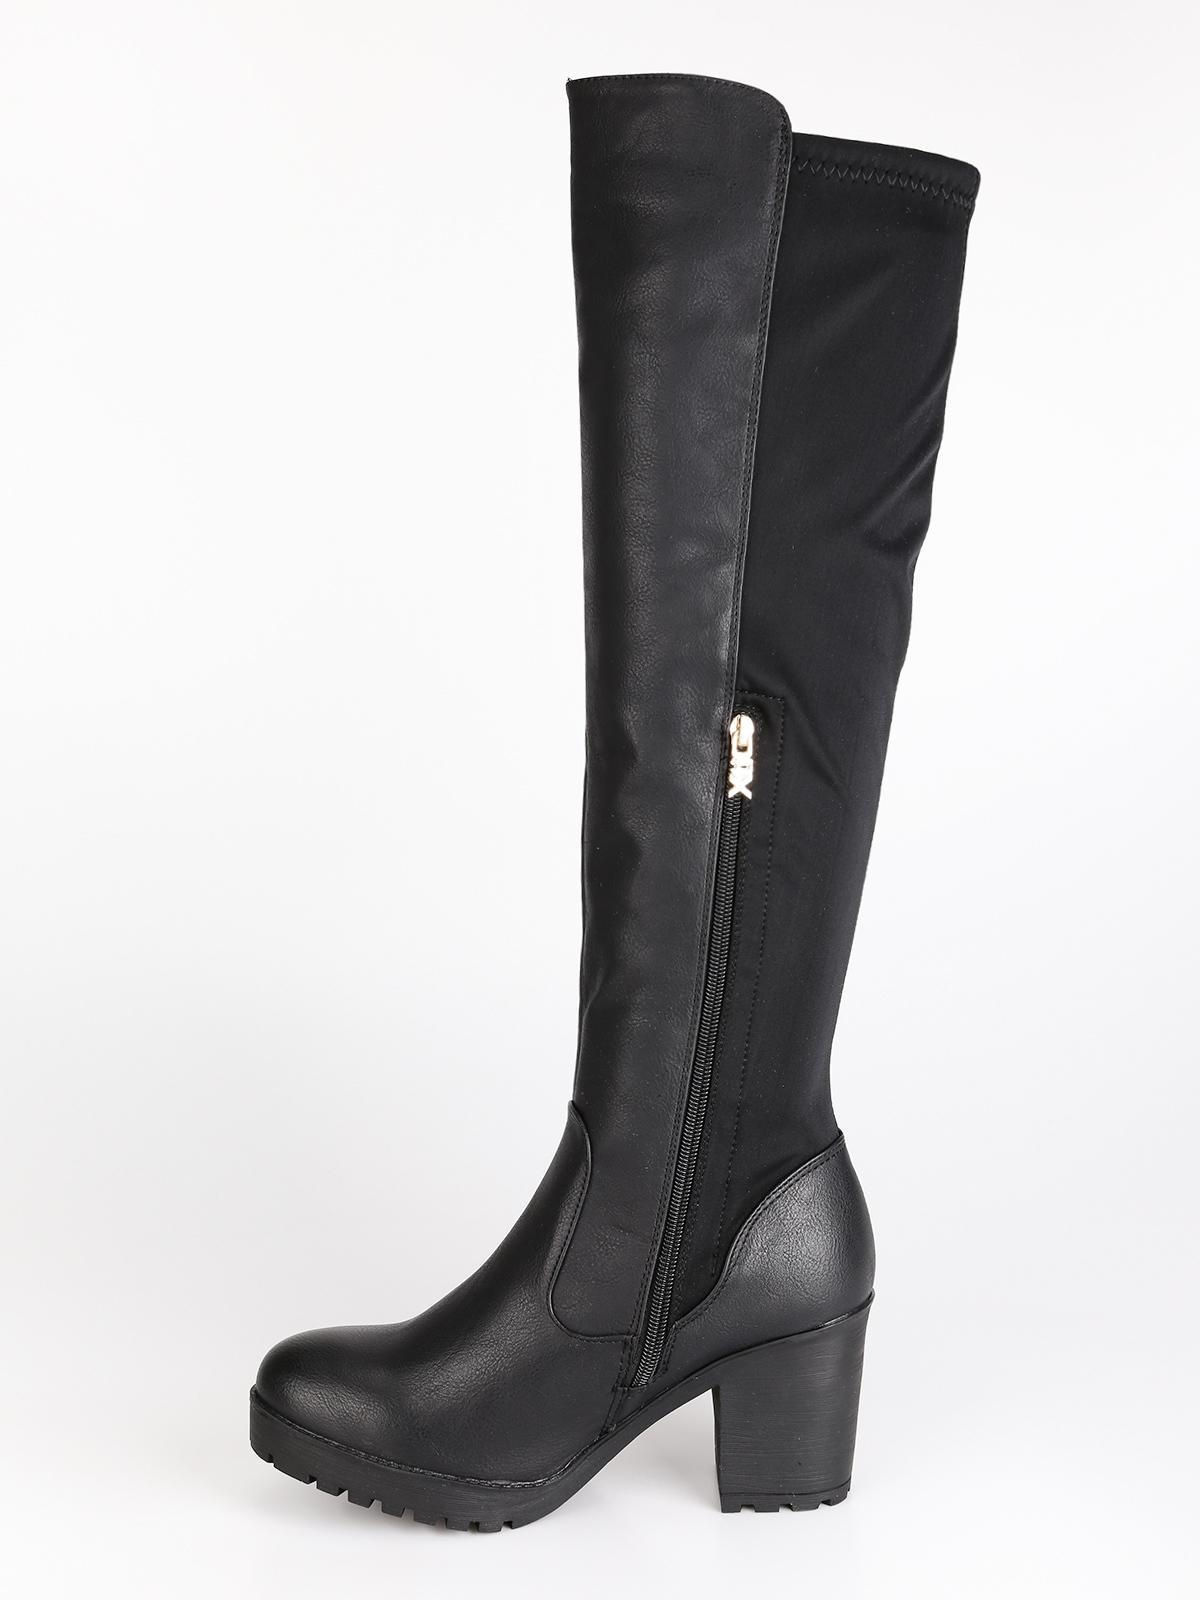 finest selection be033 b6c71 Stivali alti con tacco largo xti | MecShopping